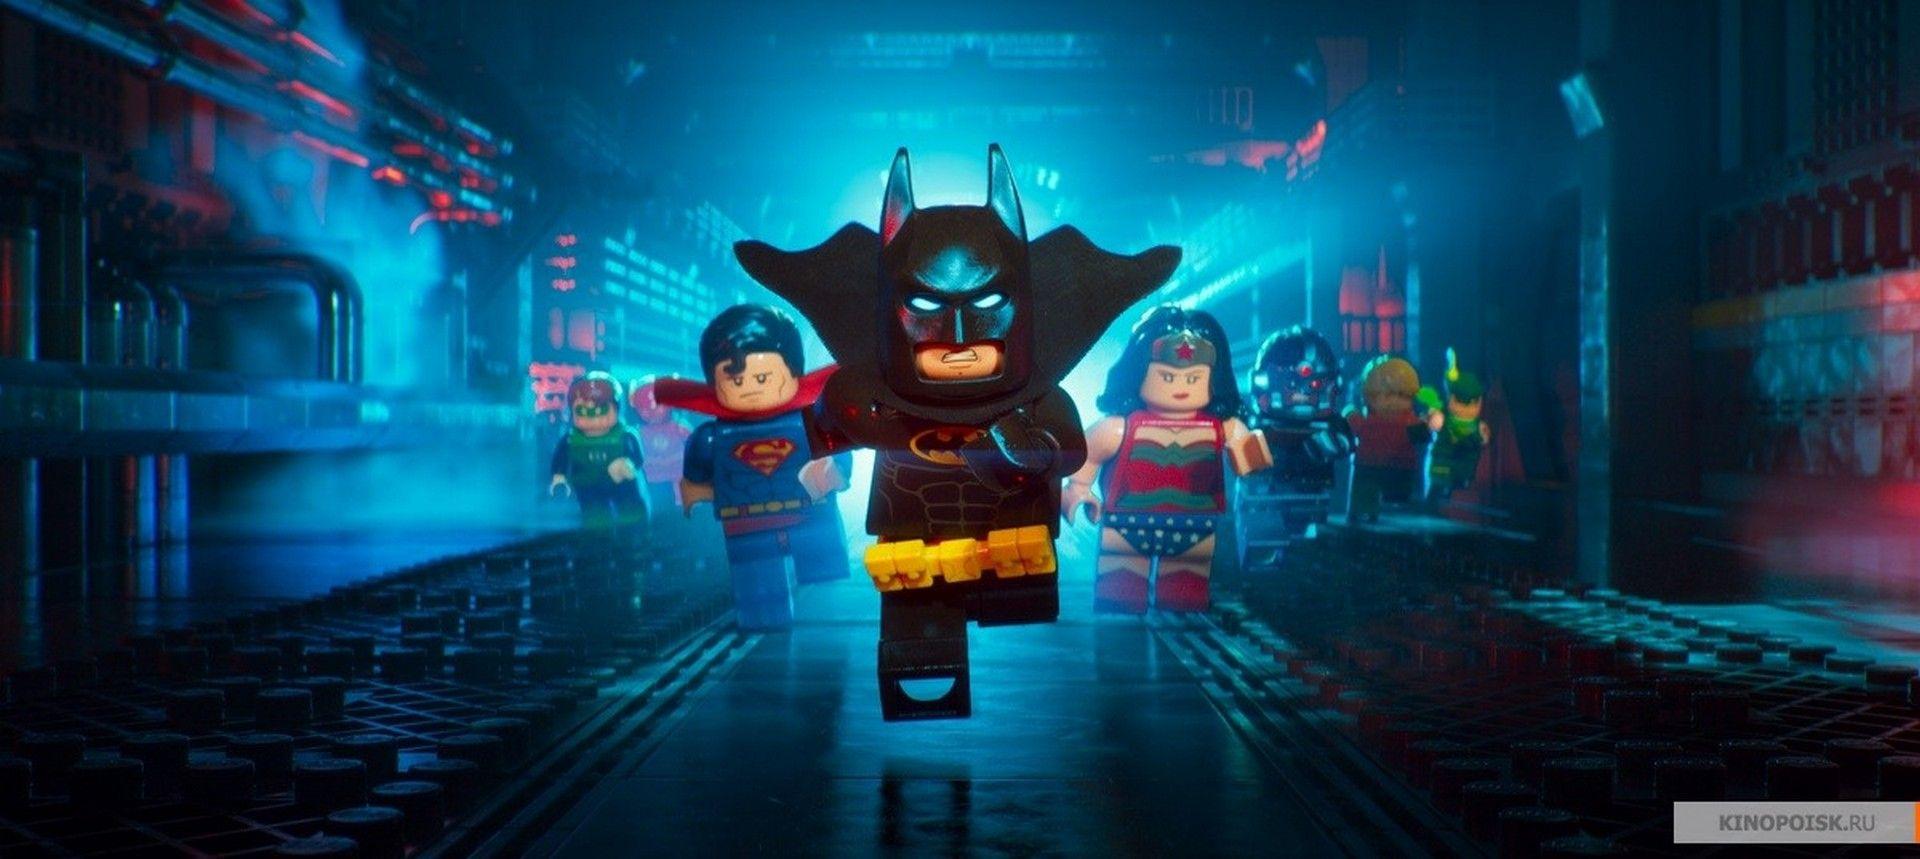 hd the lego batman movie wallpaper | the lego batman movie